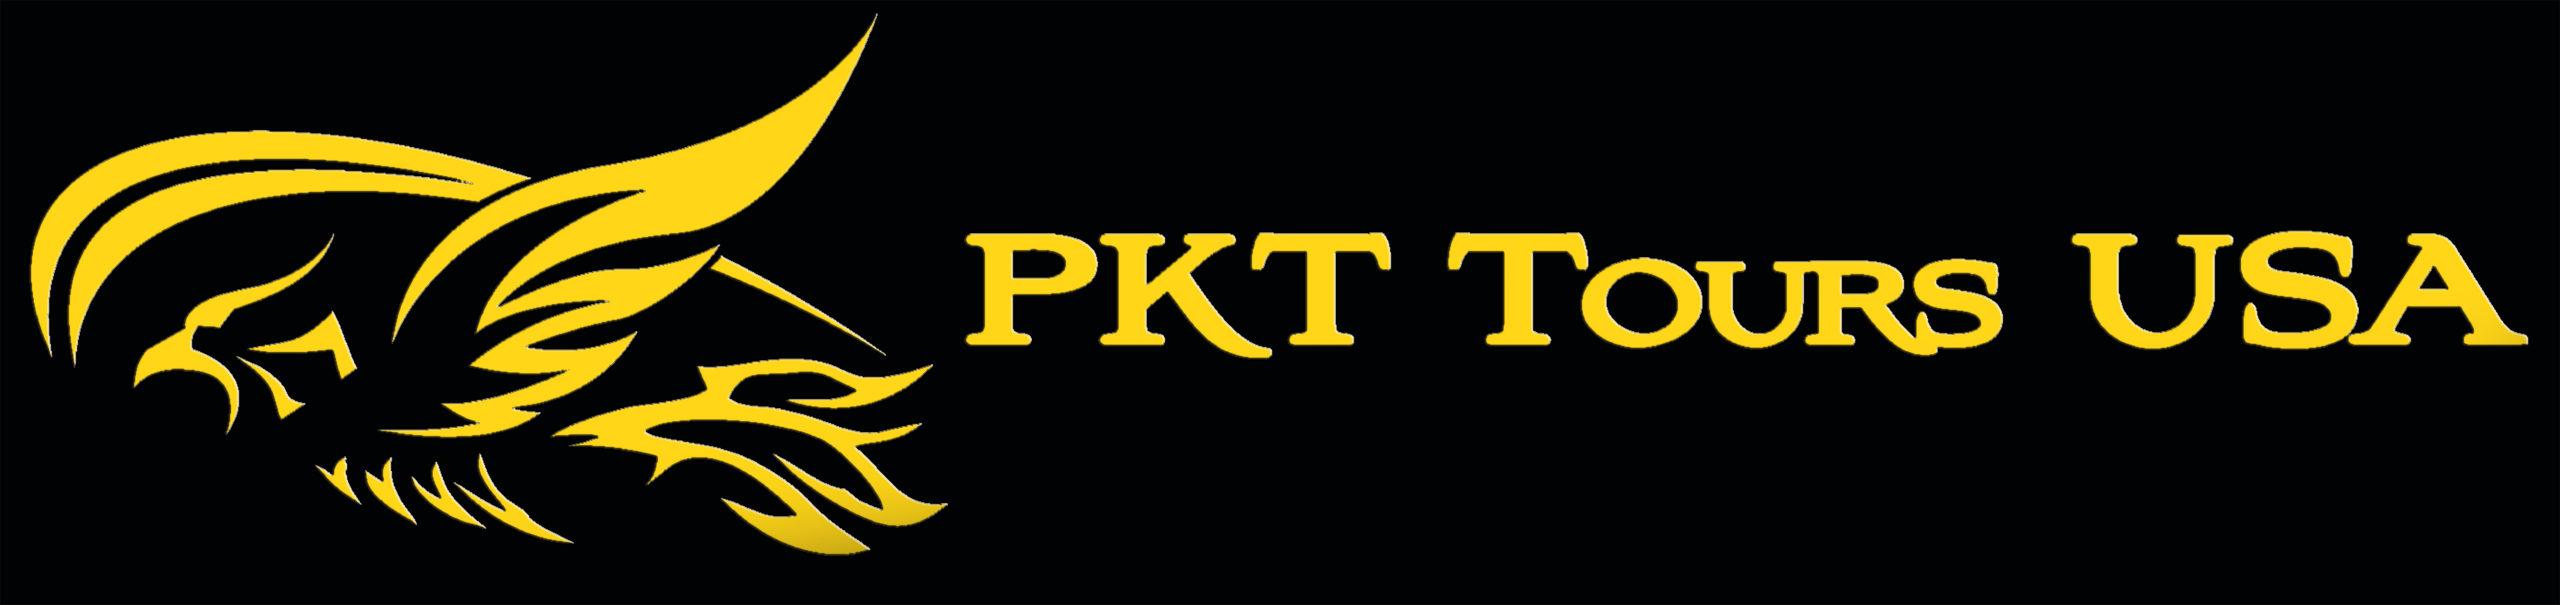 PKT Tours black gold